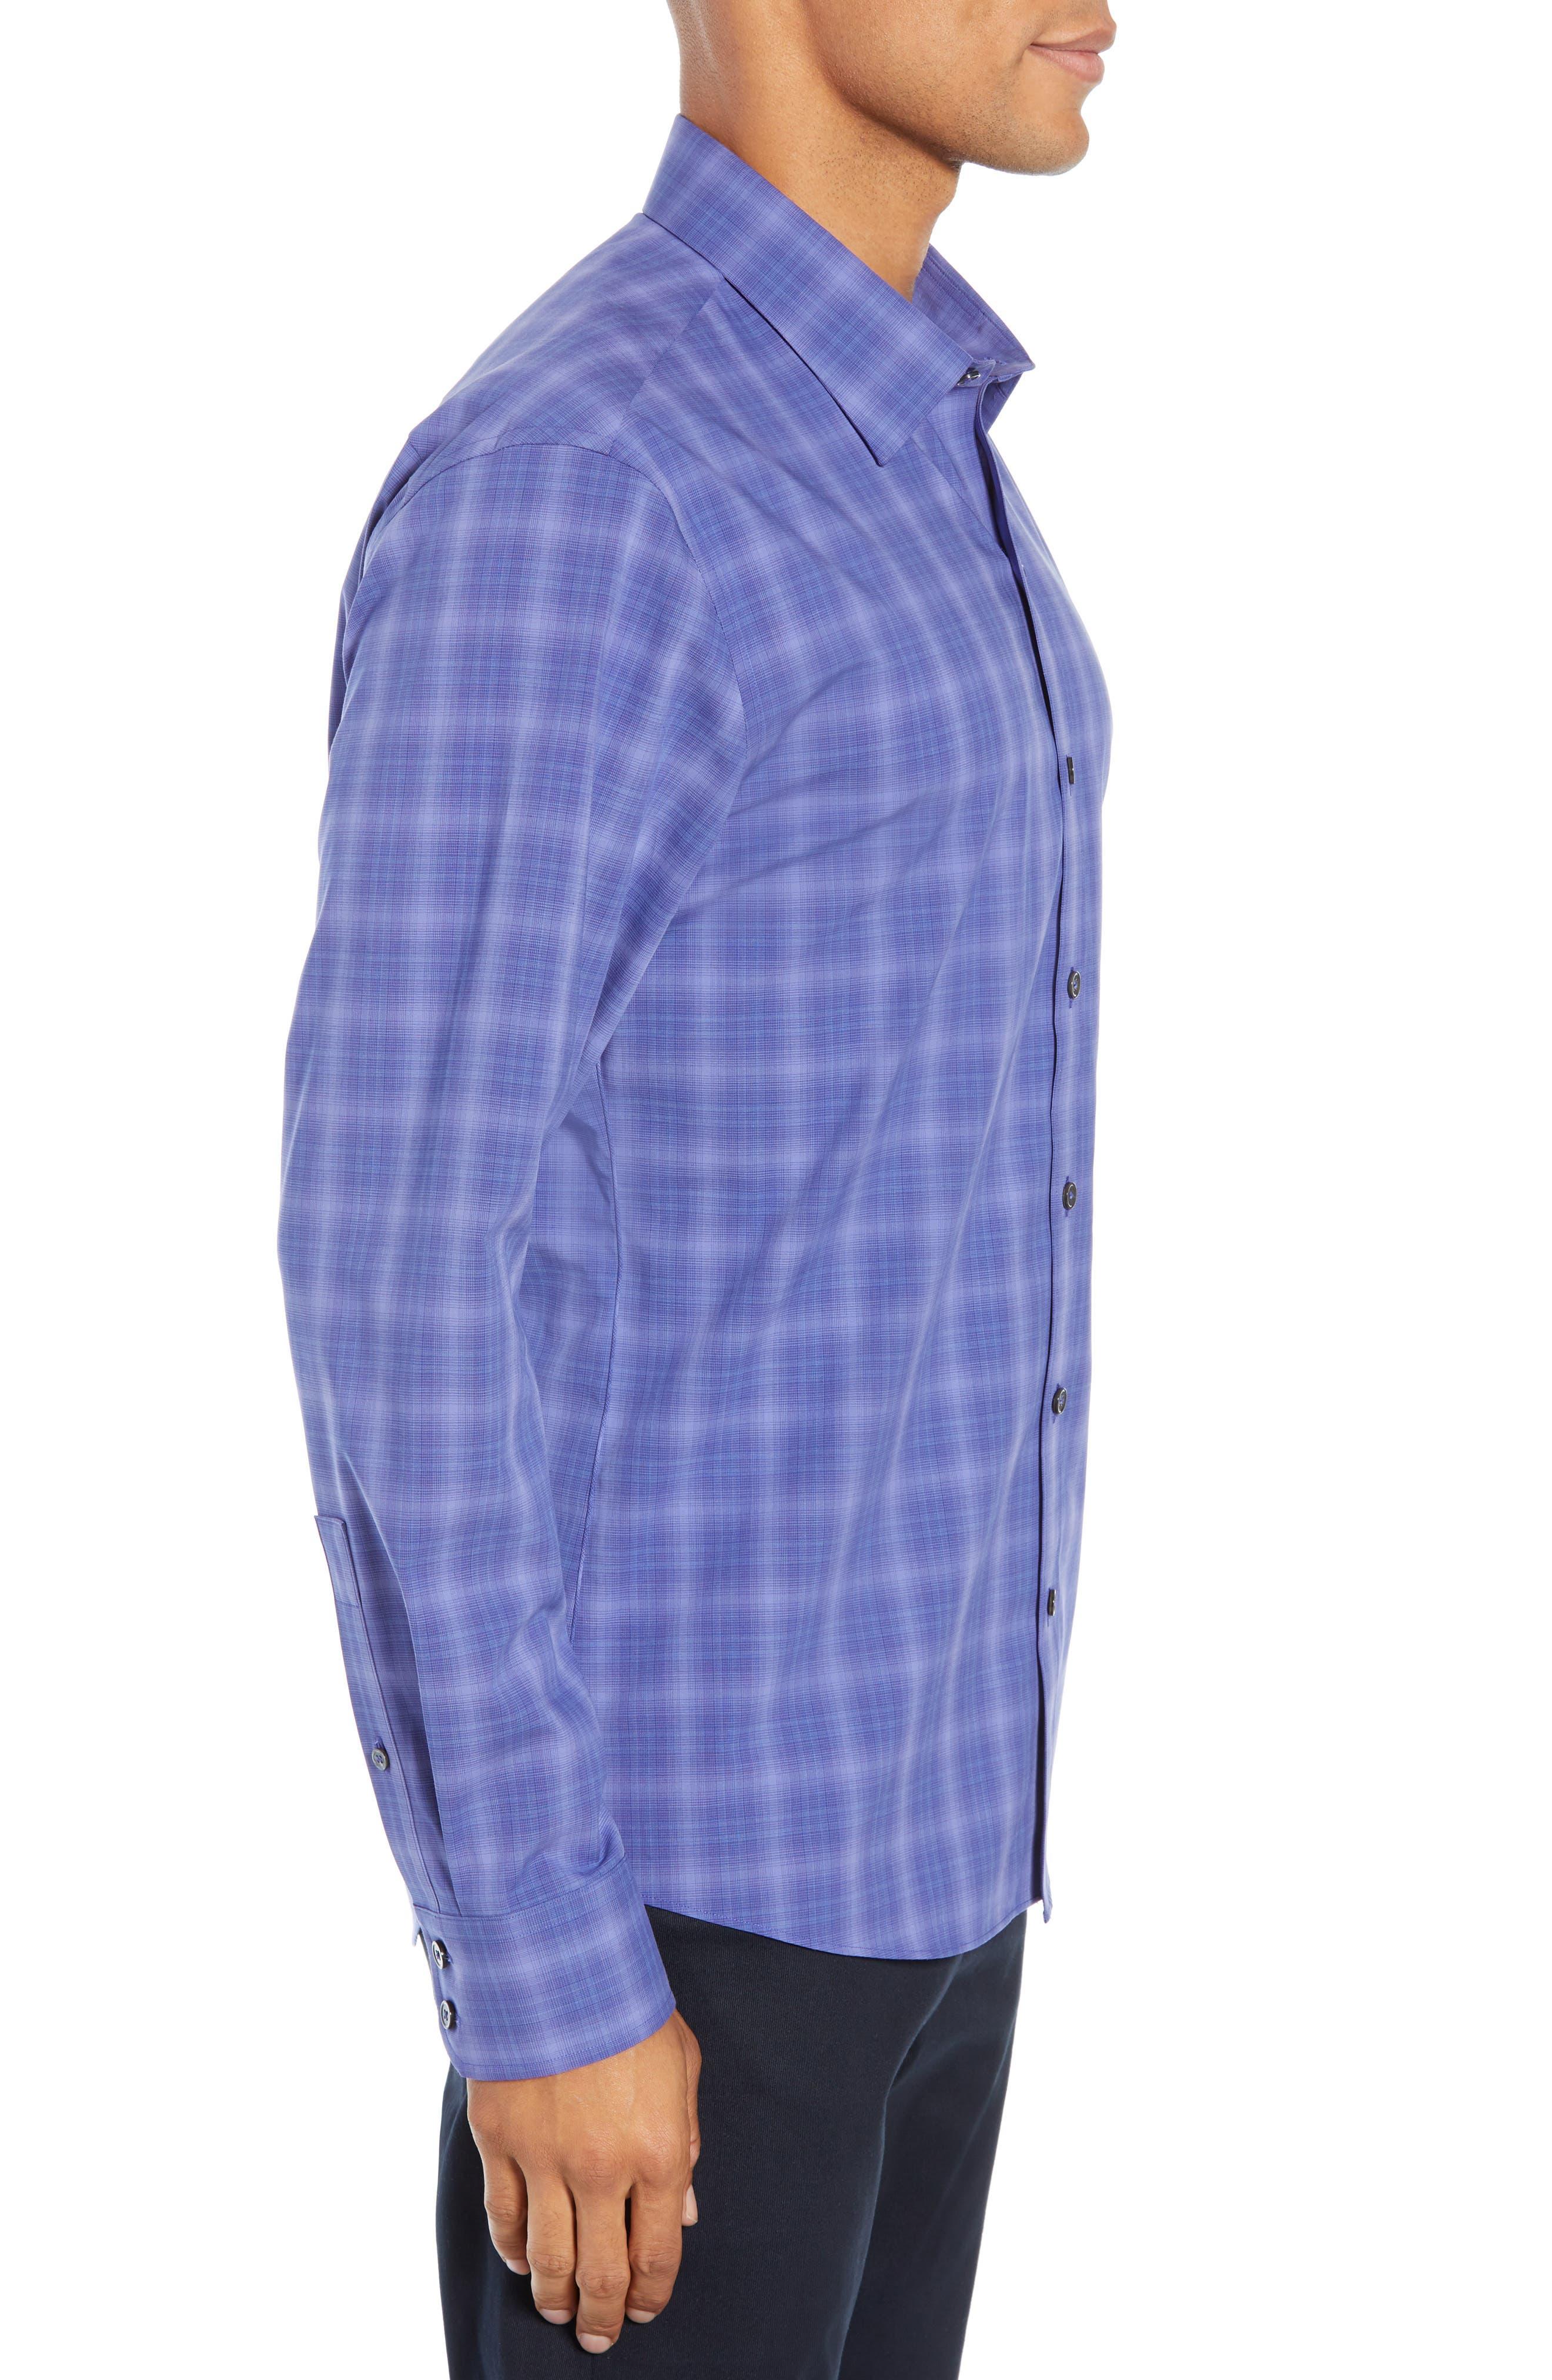 ZACHARY PRELL, Wandy Regular Fit Check Sport Shirt, Alternate thumbnail 4, color, LIGHT PURPLE